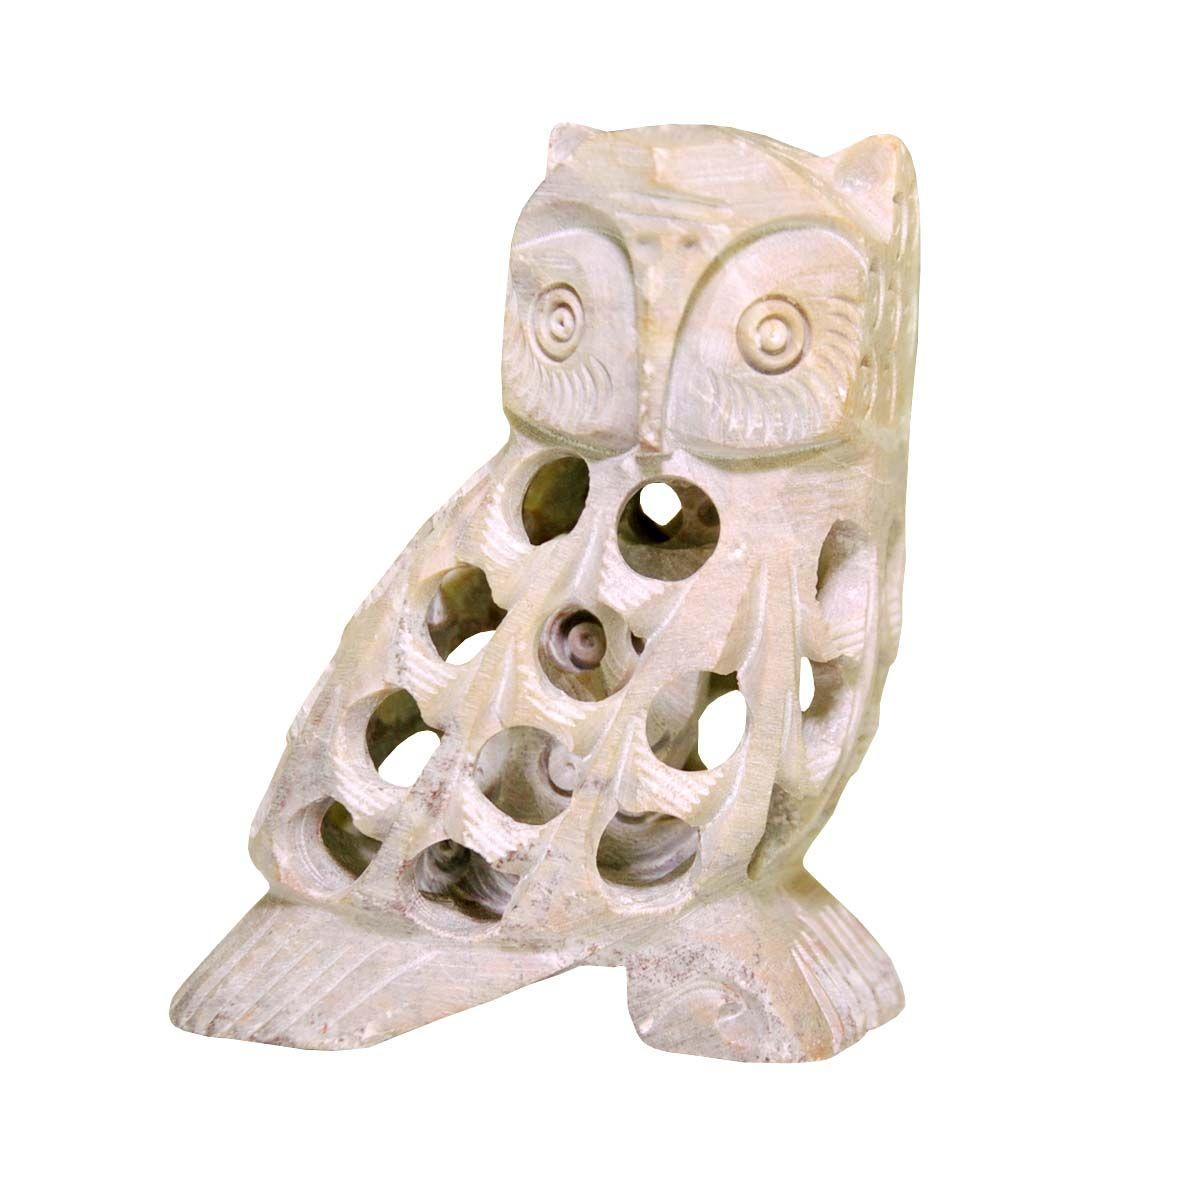 Wholesale Owl Figurine U0026 Statue   Buy In Bulk Handmade 3u201d Soapstone  Filigree Owl Sculpture · Home Office DecorWhite ...